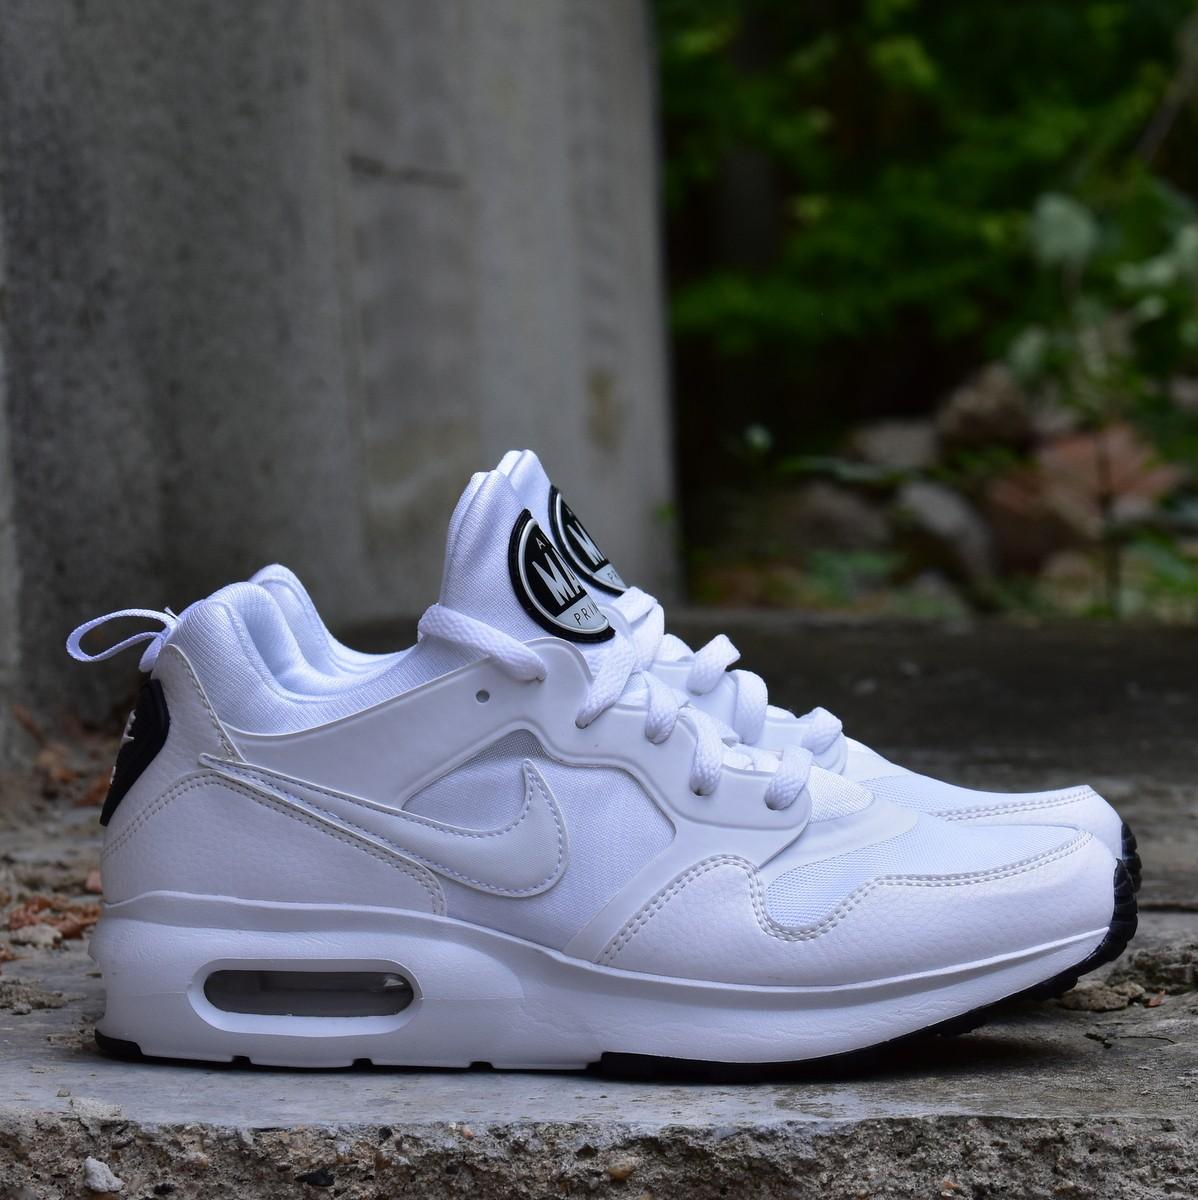 13557bc53d0 Nike AIR MAX PRIME Pánské boty EU 44 876068-100